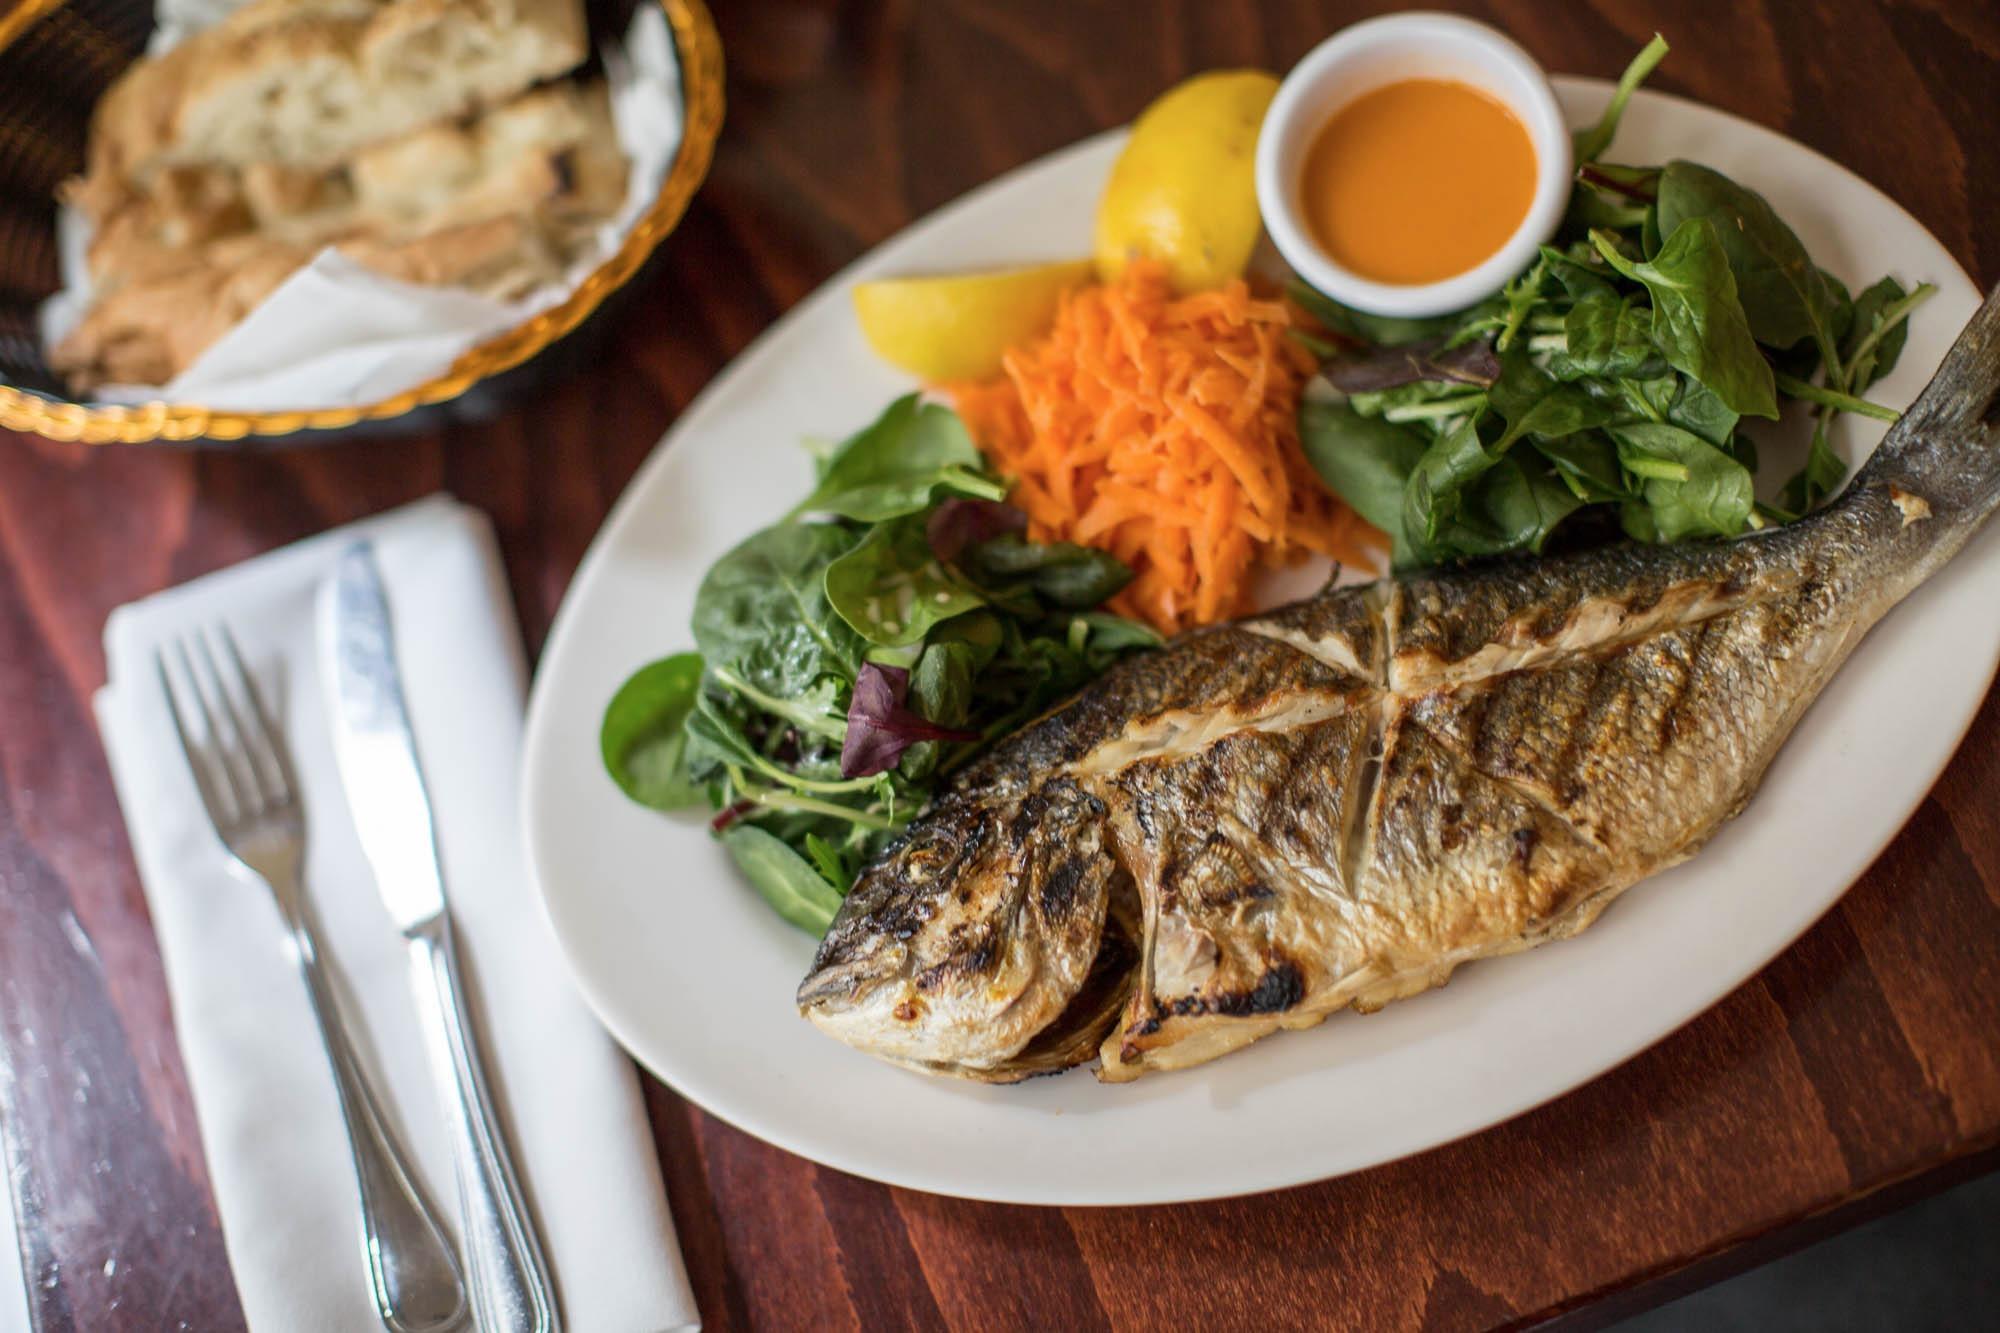 Akdeniz mediterranean restaurant in new york ny whitepages for Athena mediterranean cuisine ny